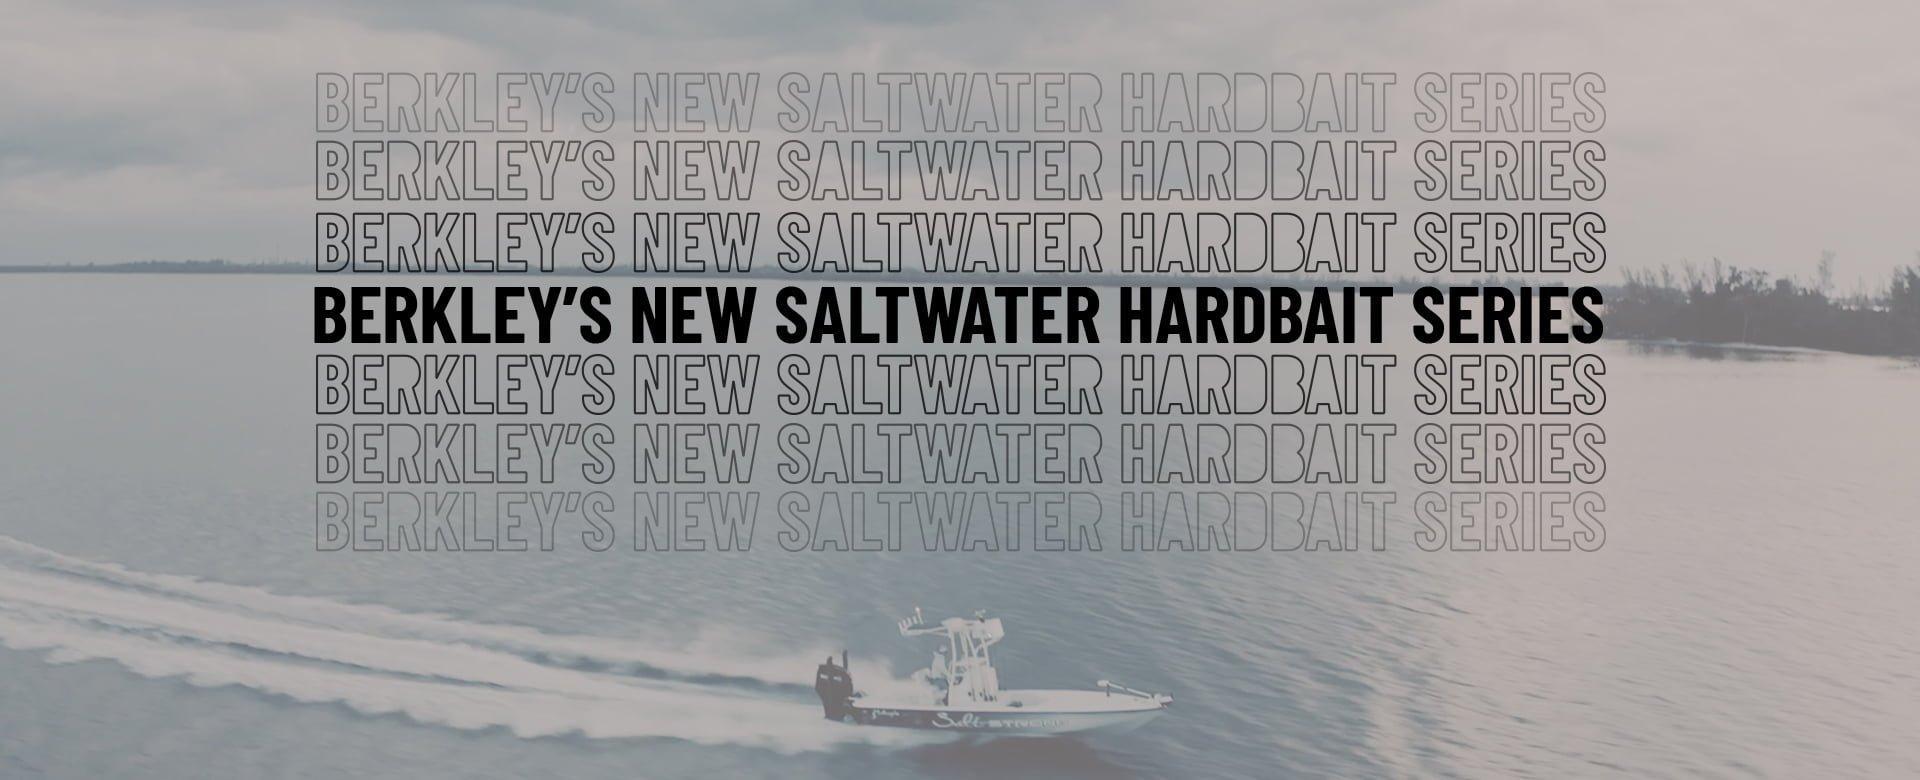 Berkley's new saltwater hardbait series